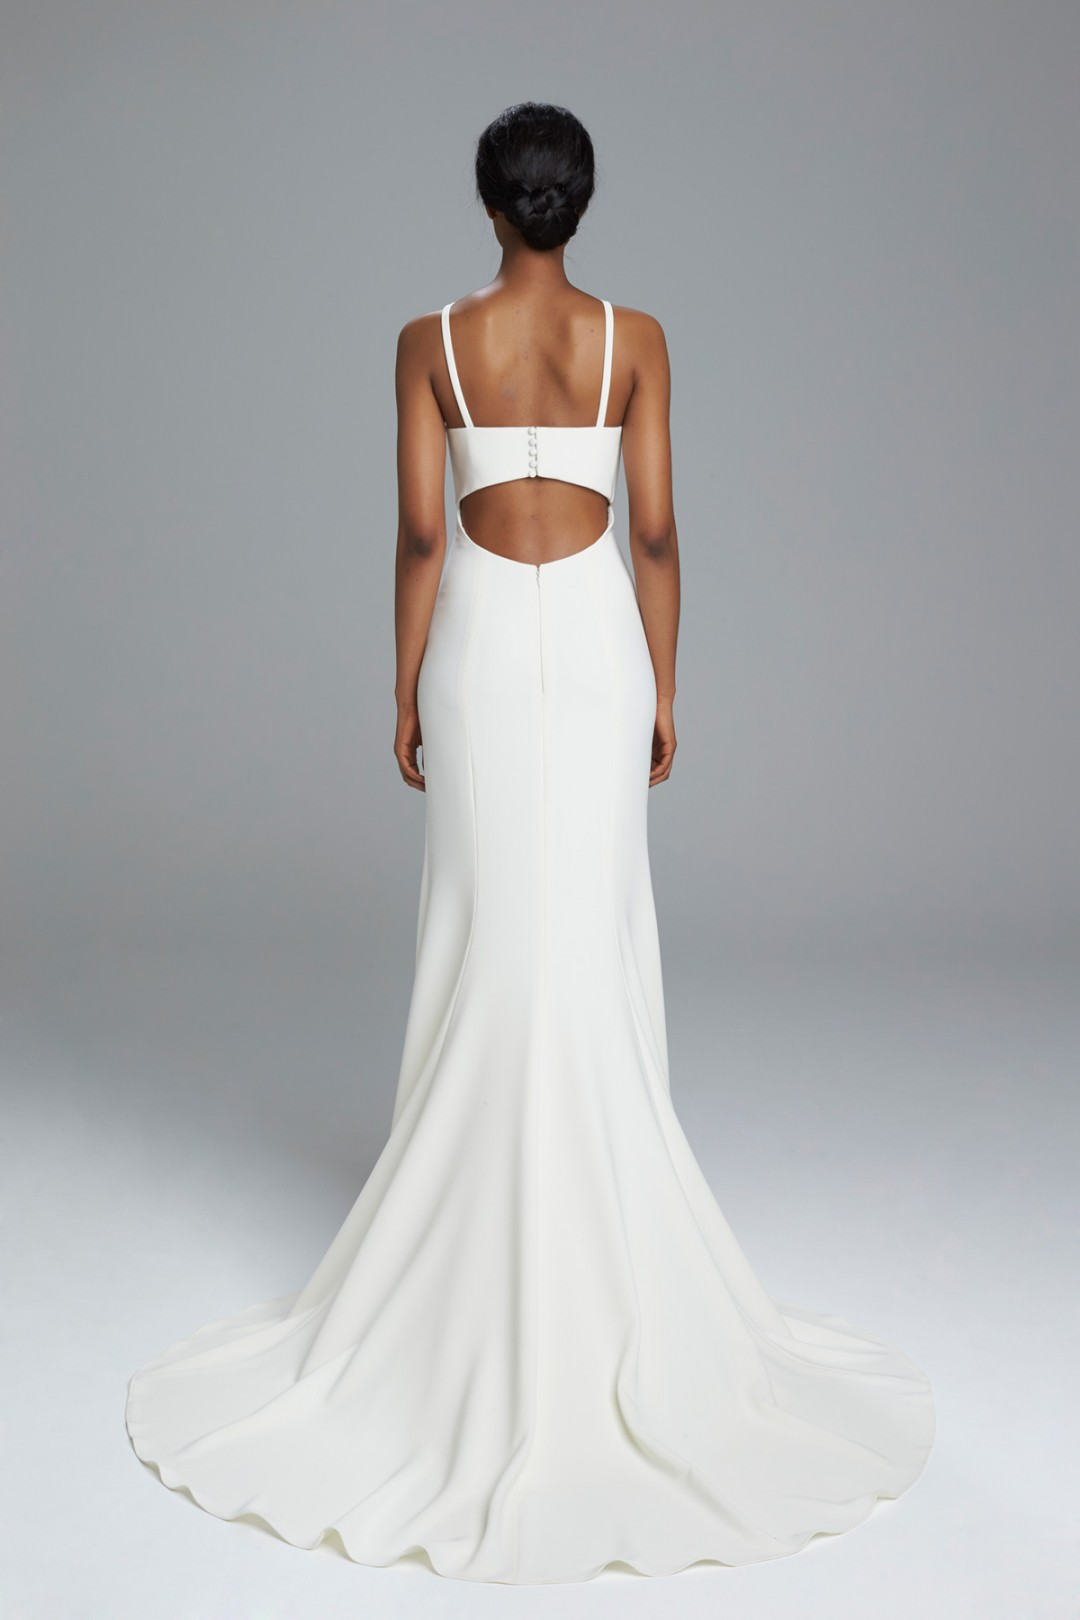 Crepe-fit-to-flare-wedding-dress_Jack-back-by-Amsale-1080x1620.jpg